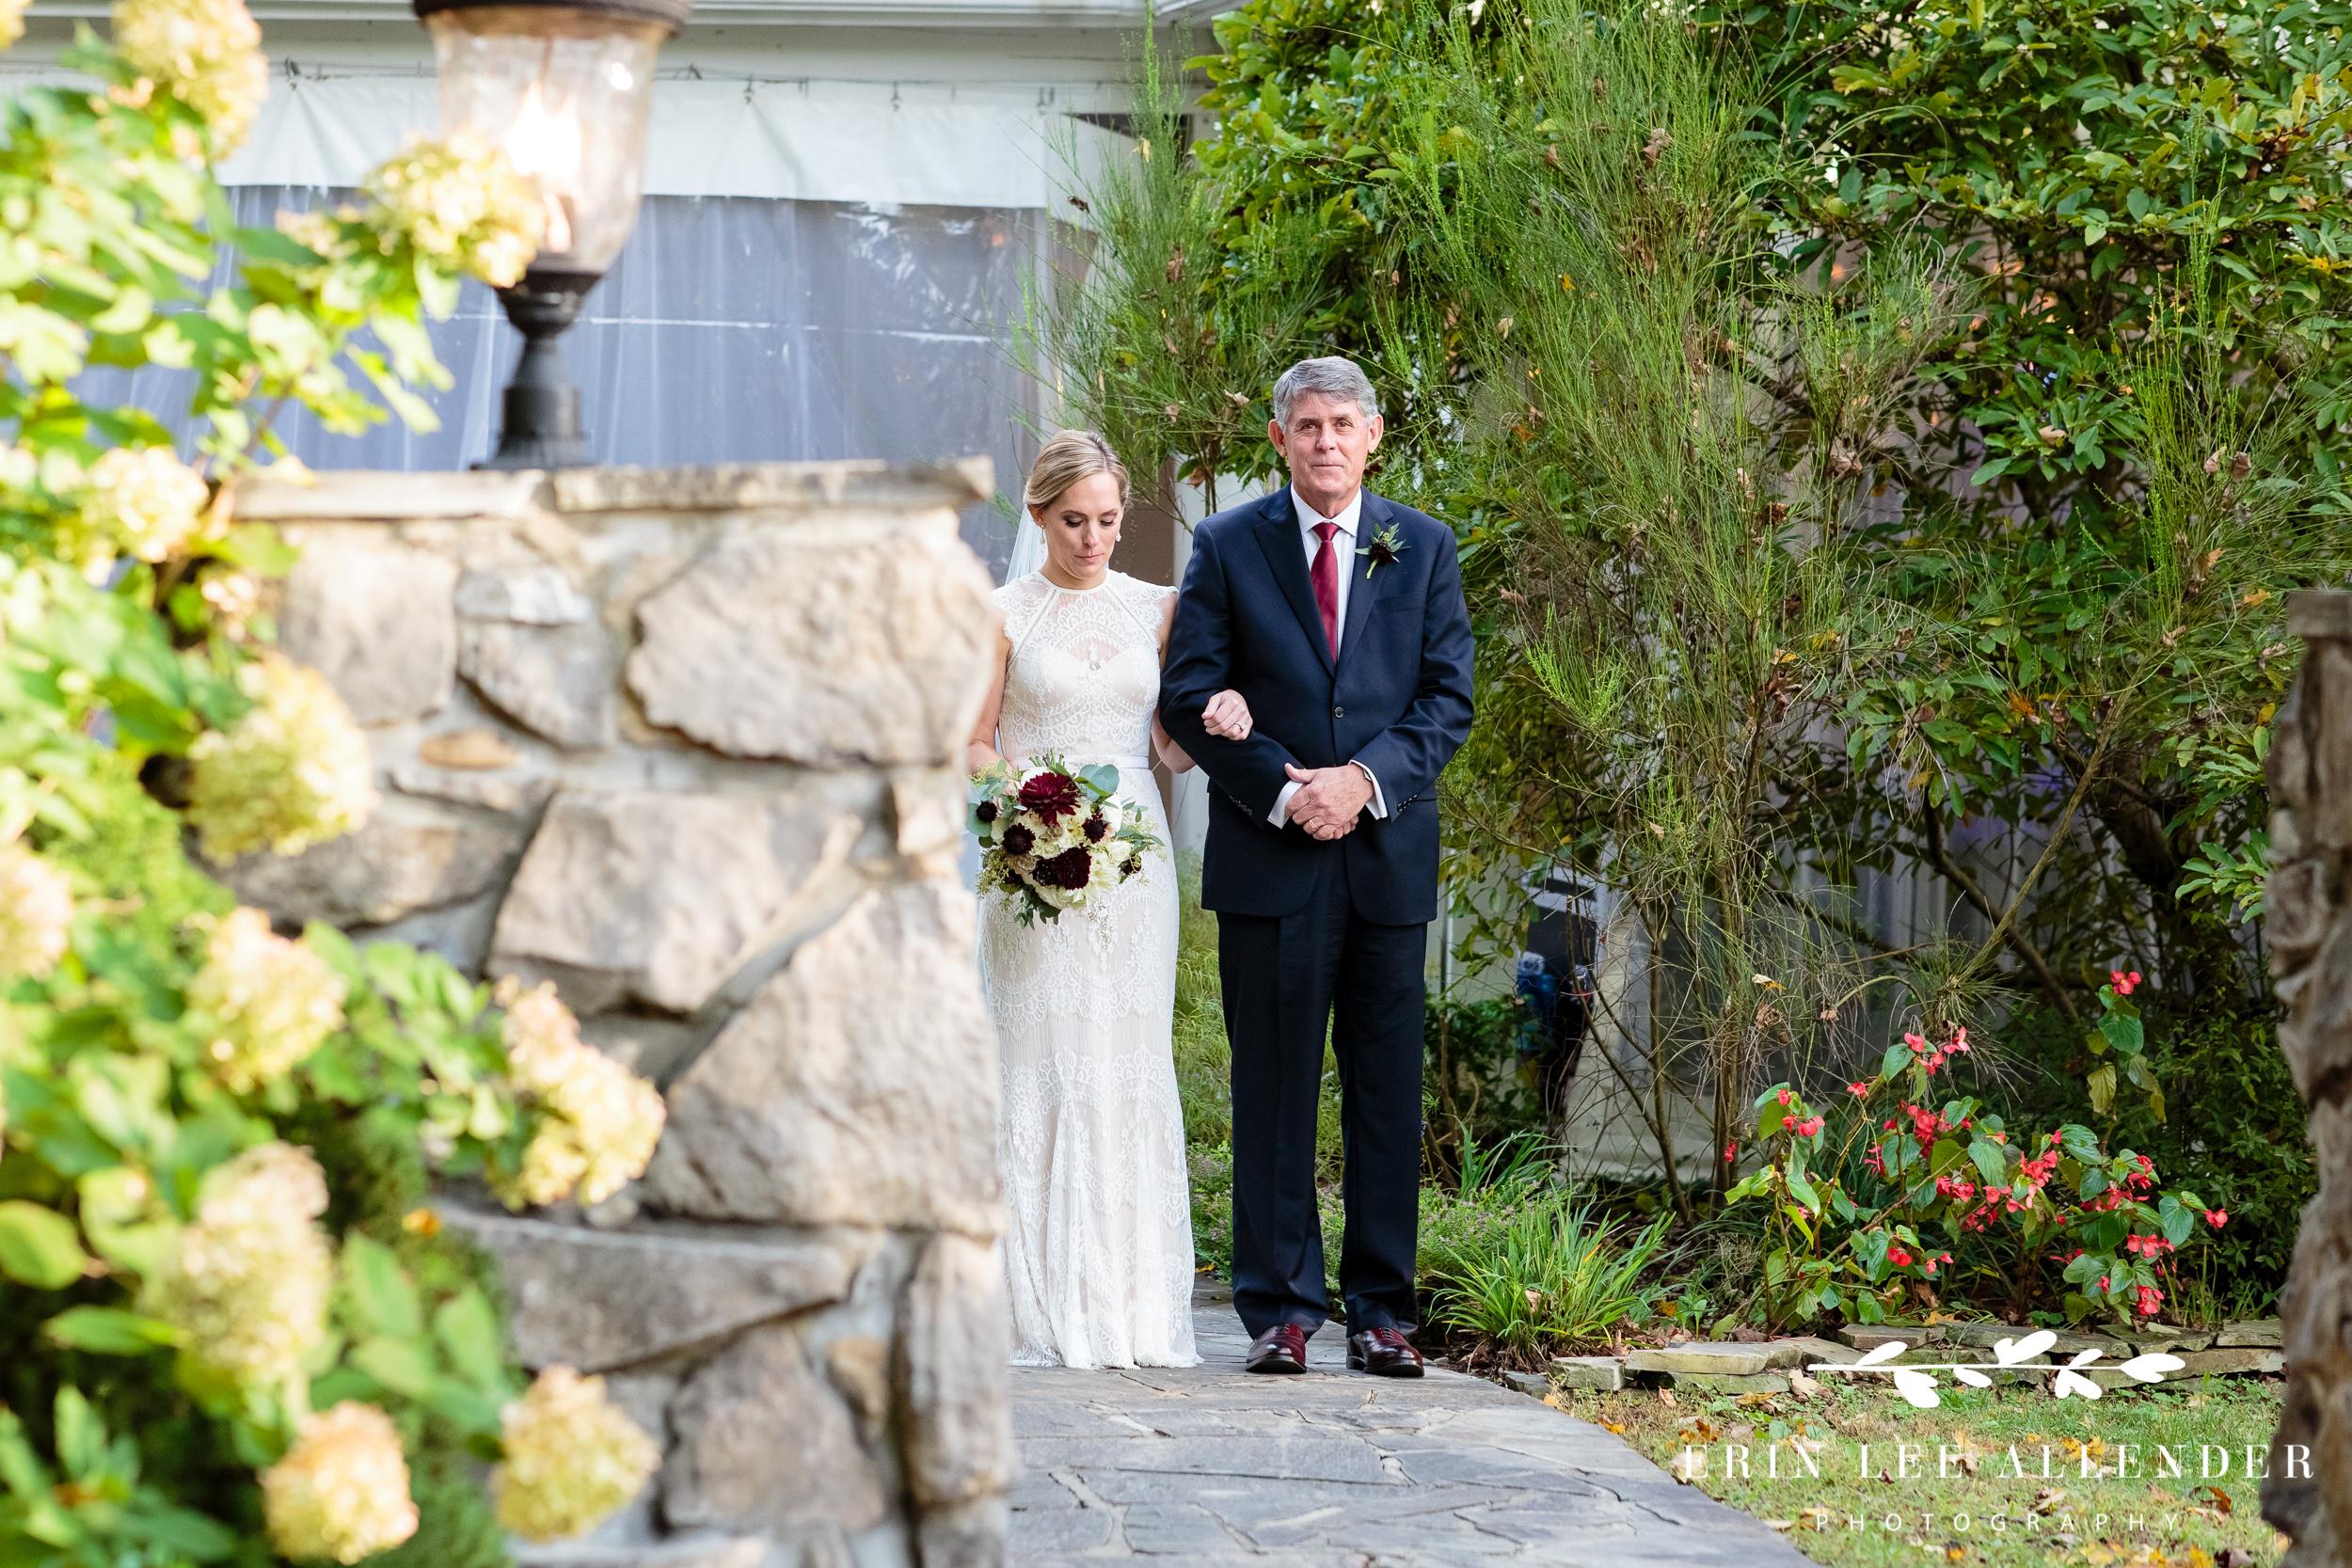 Bride-preparing-to-walk-down-aisle